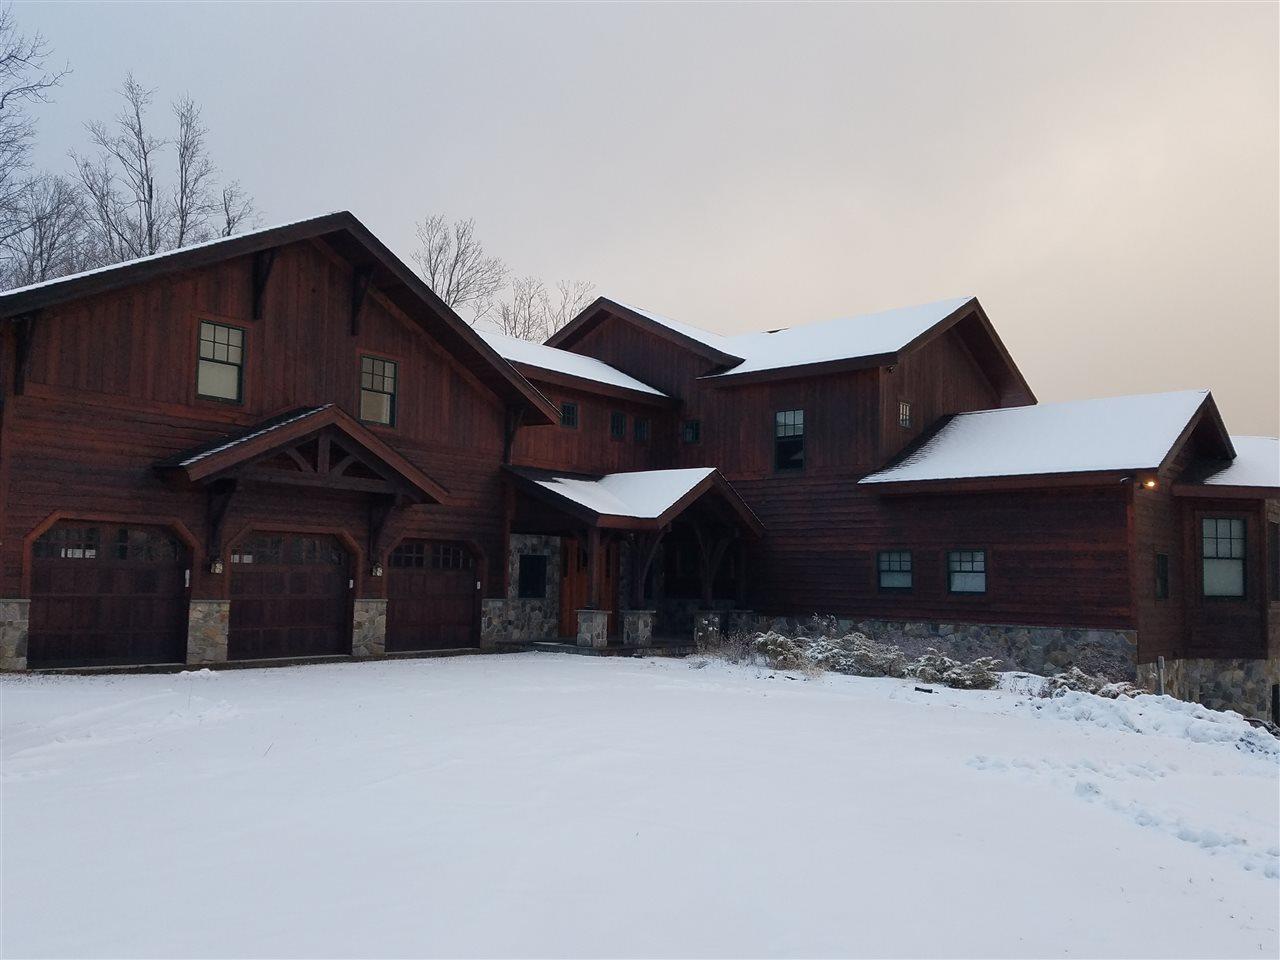 Mount-Snow-Real-Estate-4611174-1